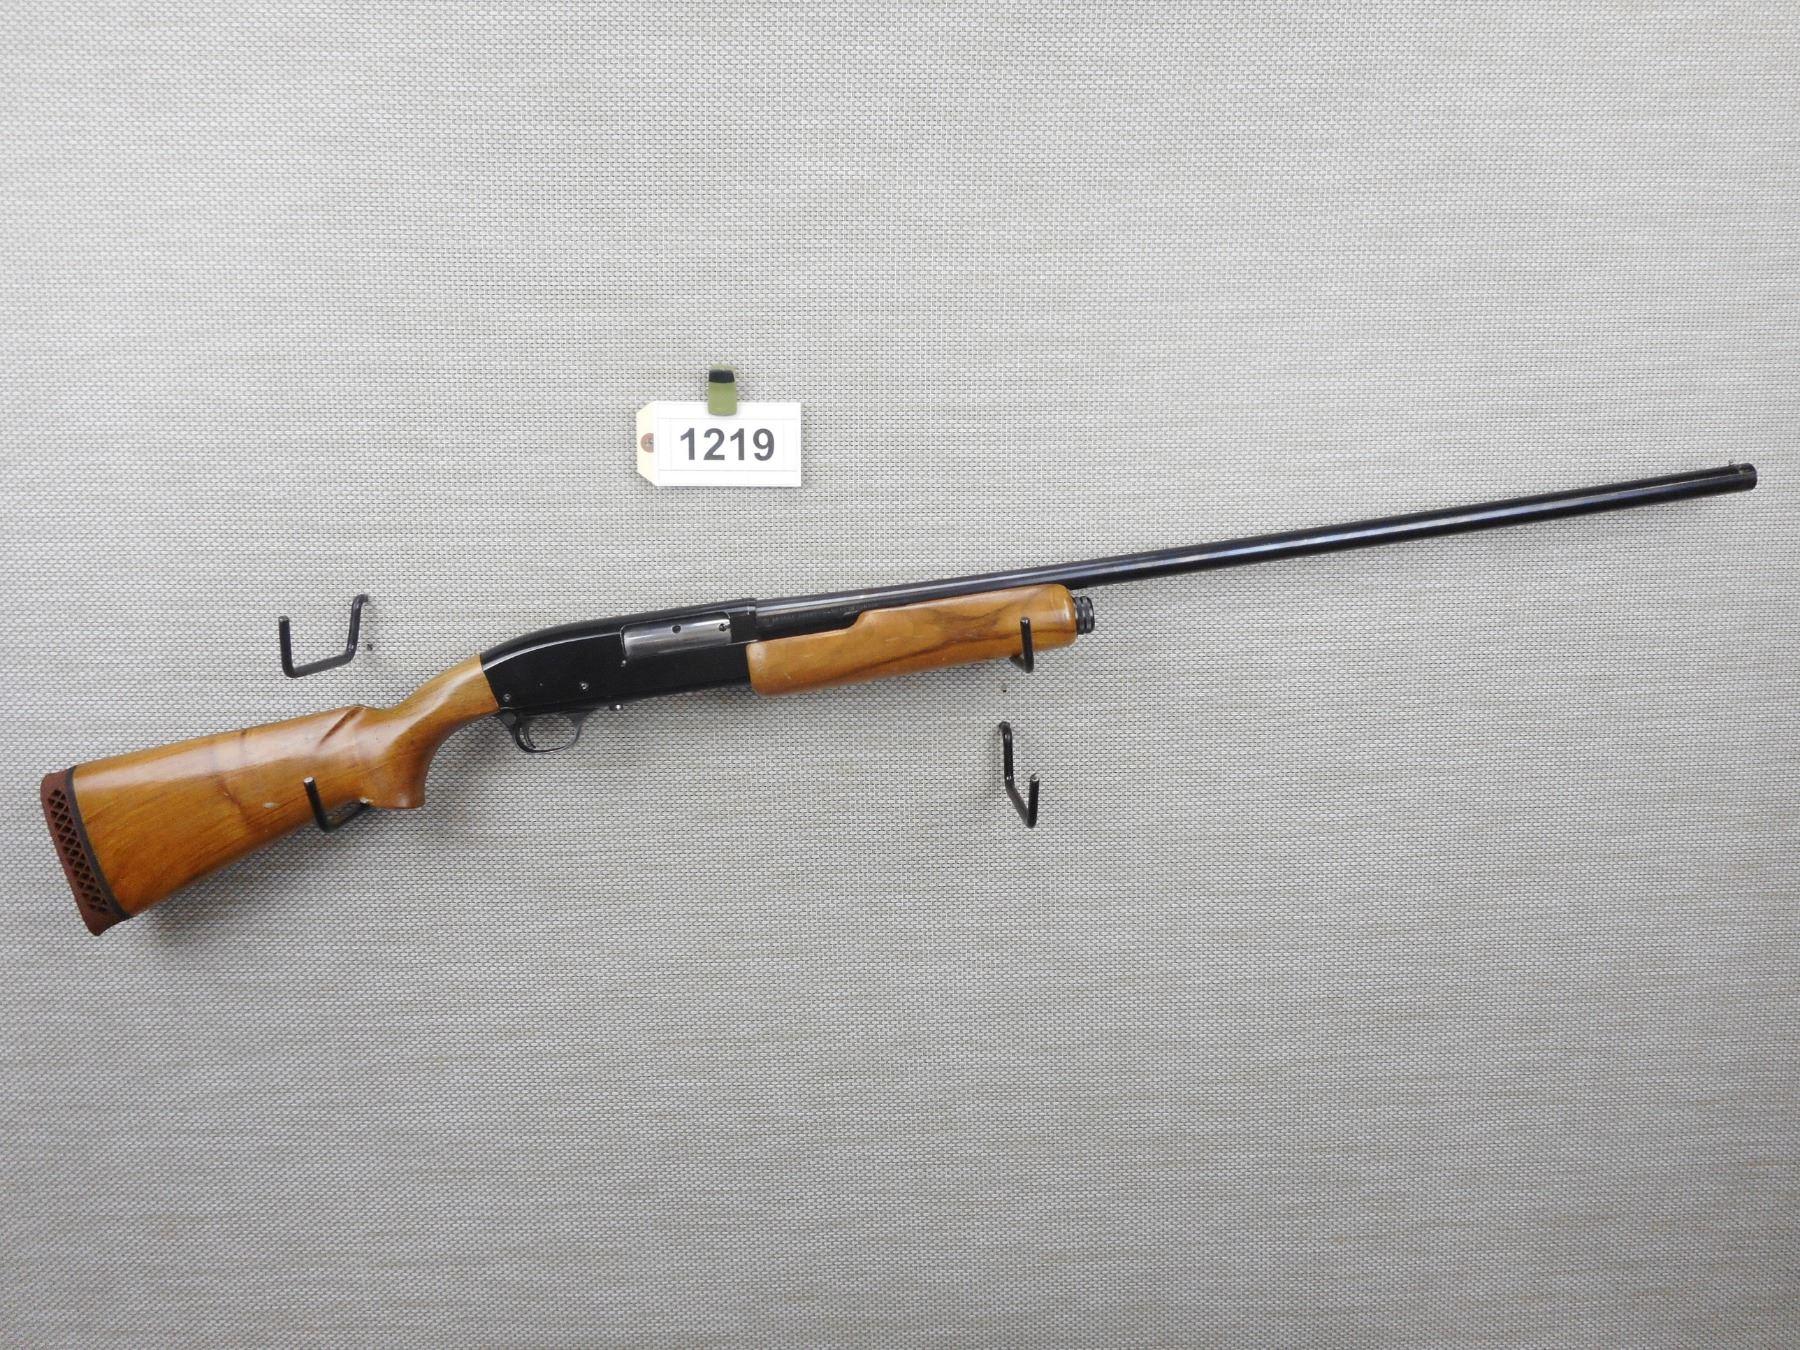 NORTH AMERICAN ARMS , MODEL: 15M MALLARD , CALIBER: 12GA X 3